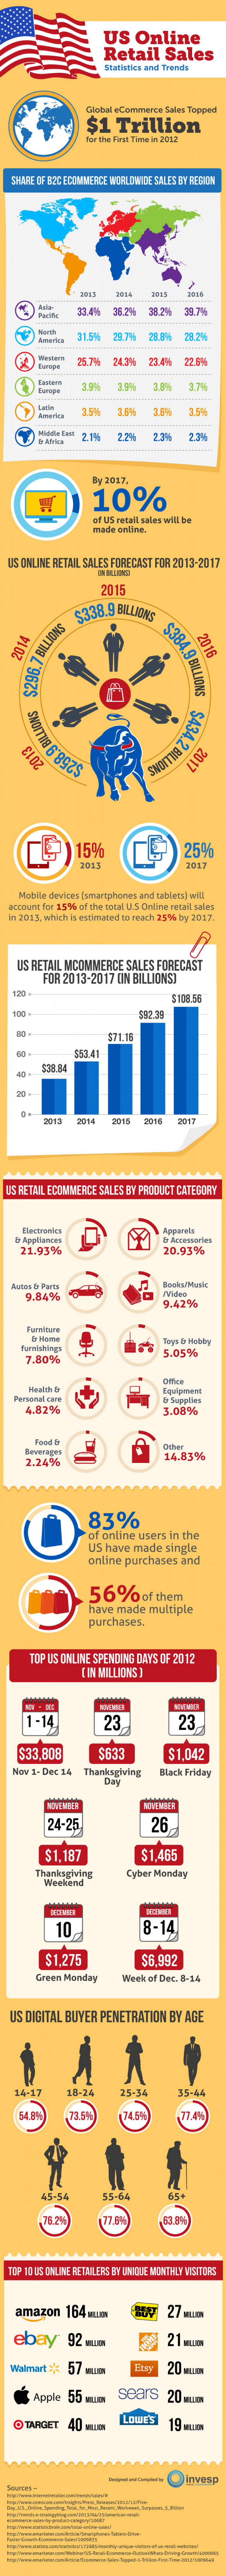 Online Retail Sales Trends